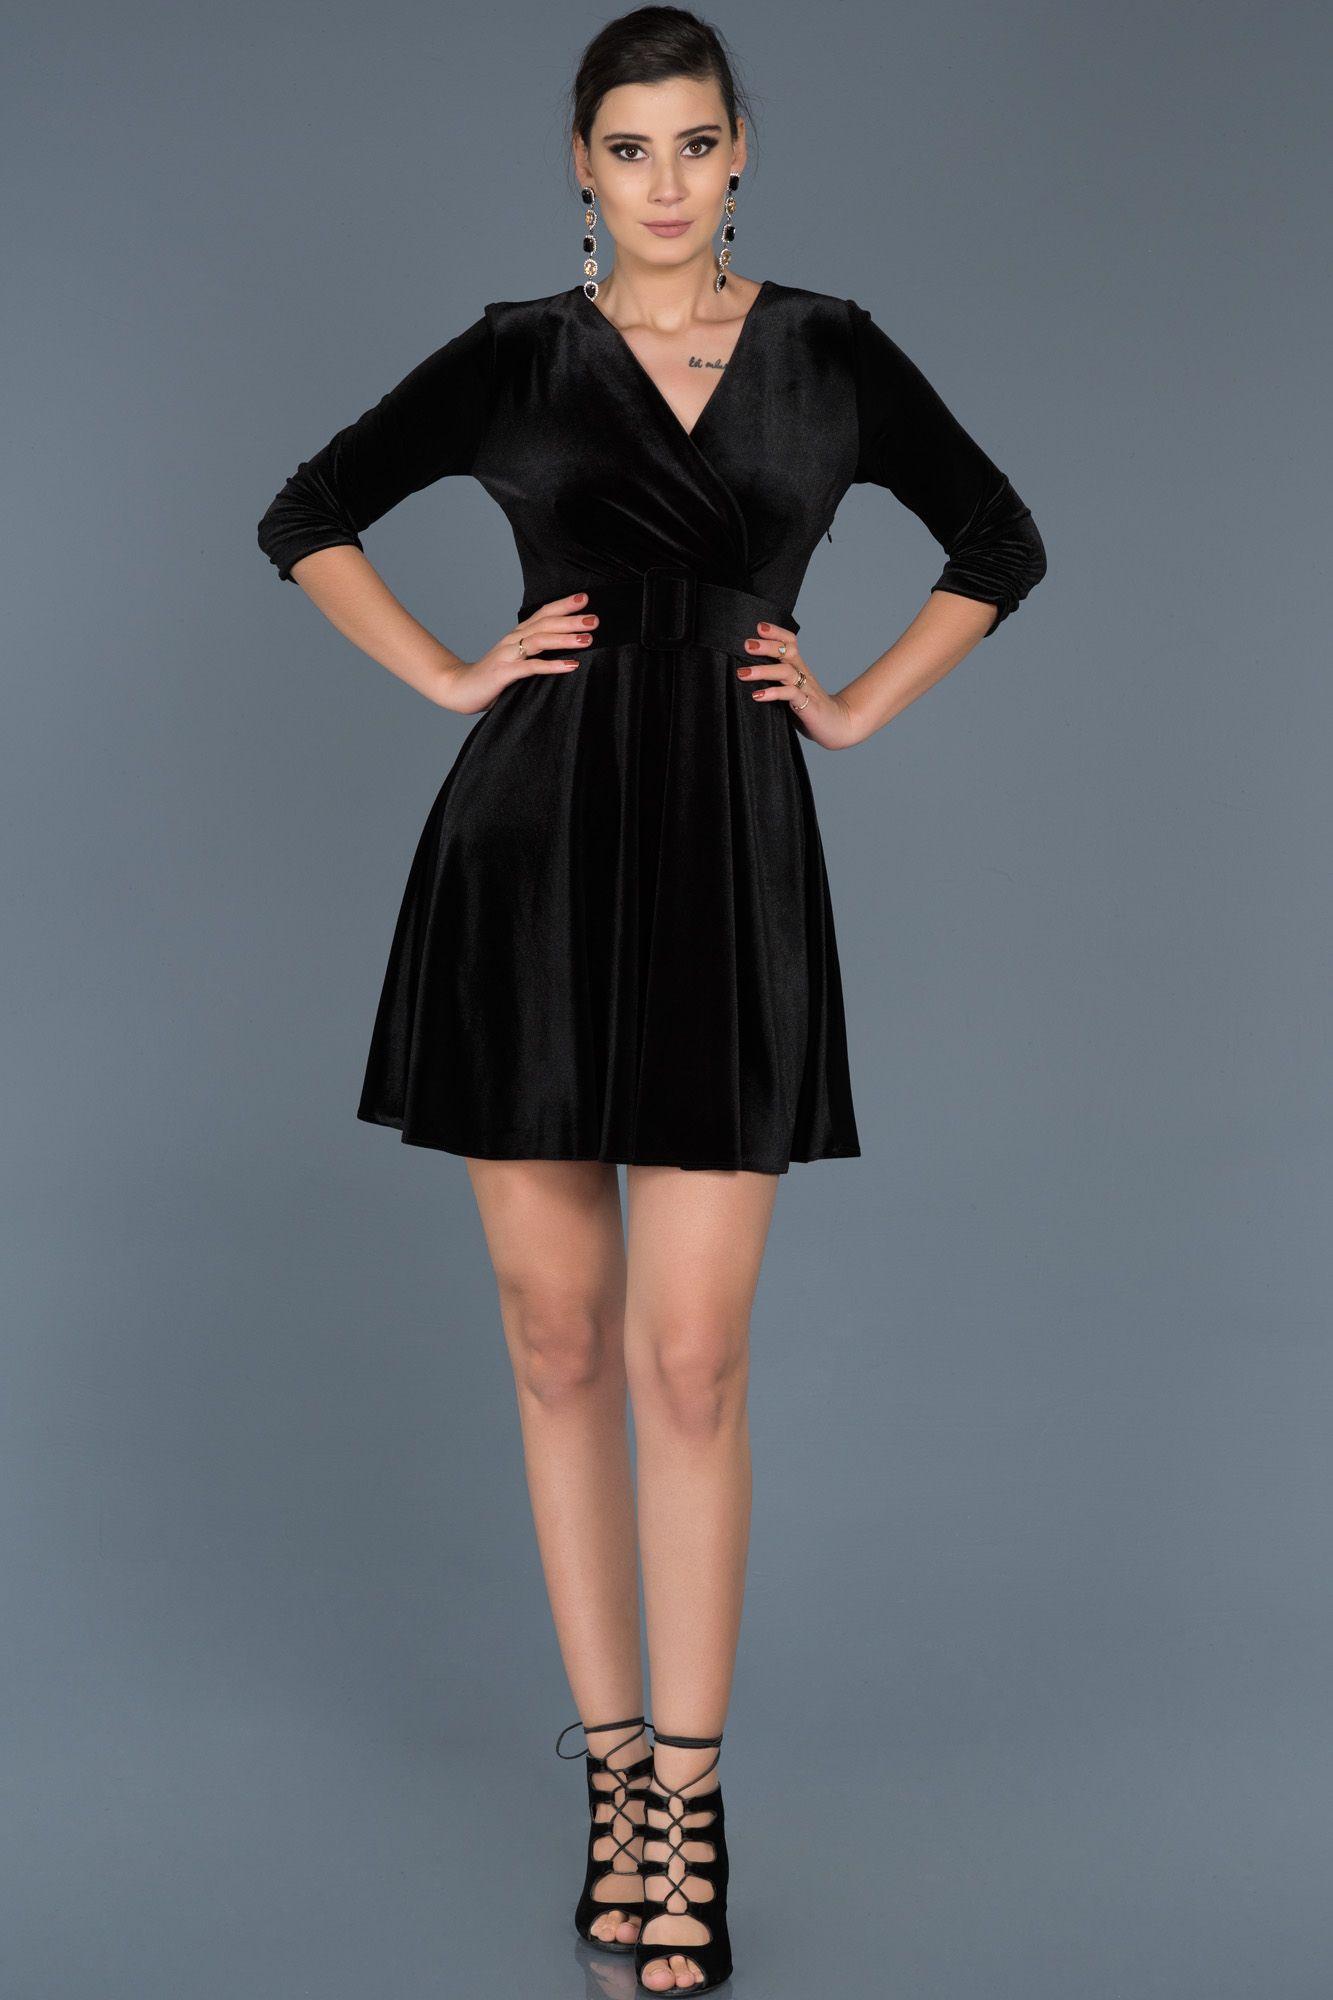 Siyah V Yaka Kemerli Kadife Elbise Abk295 Elbise Kisa Elbiseler The Dress